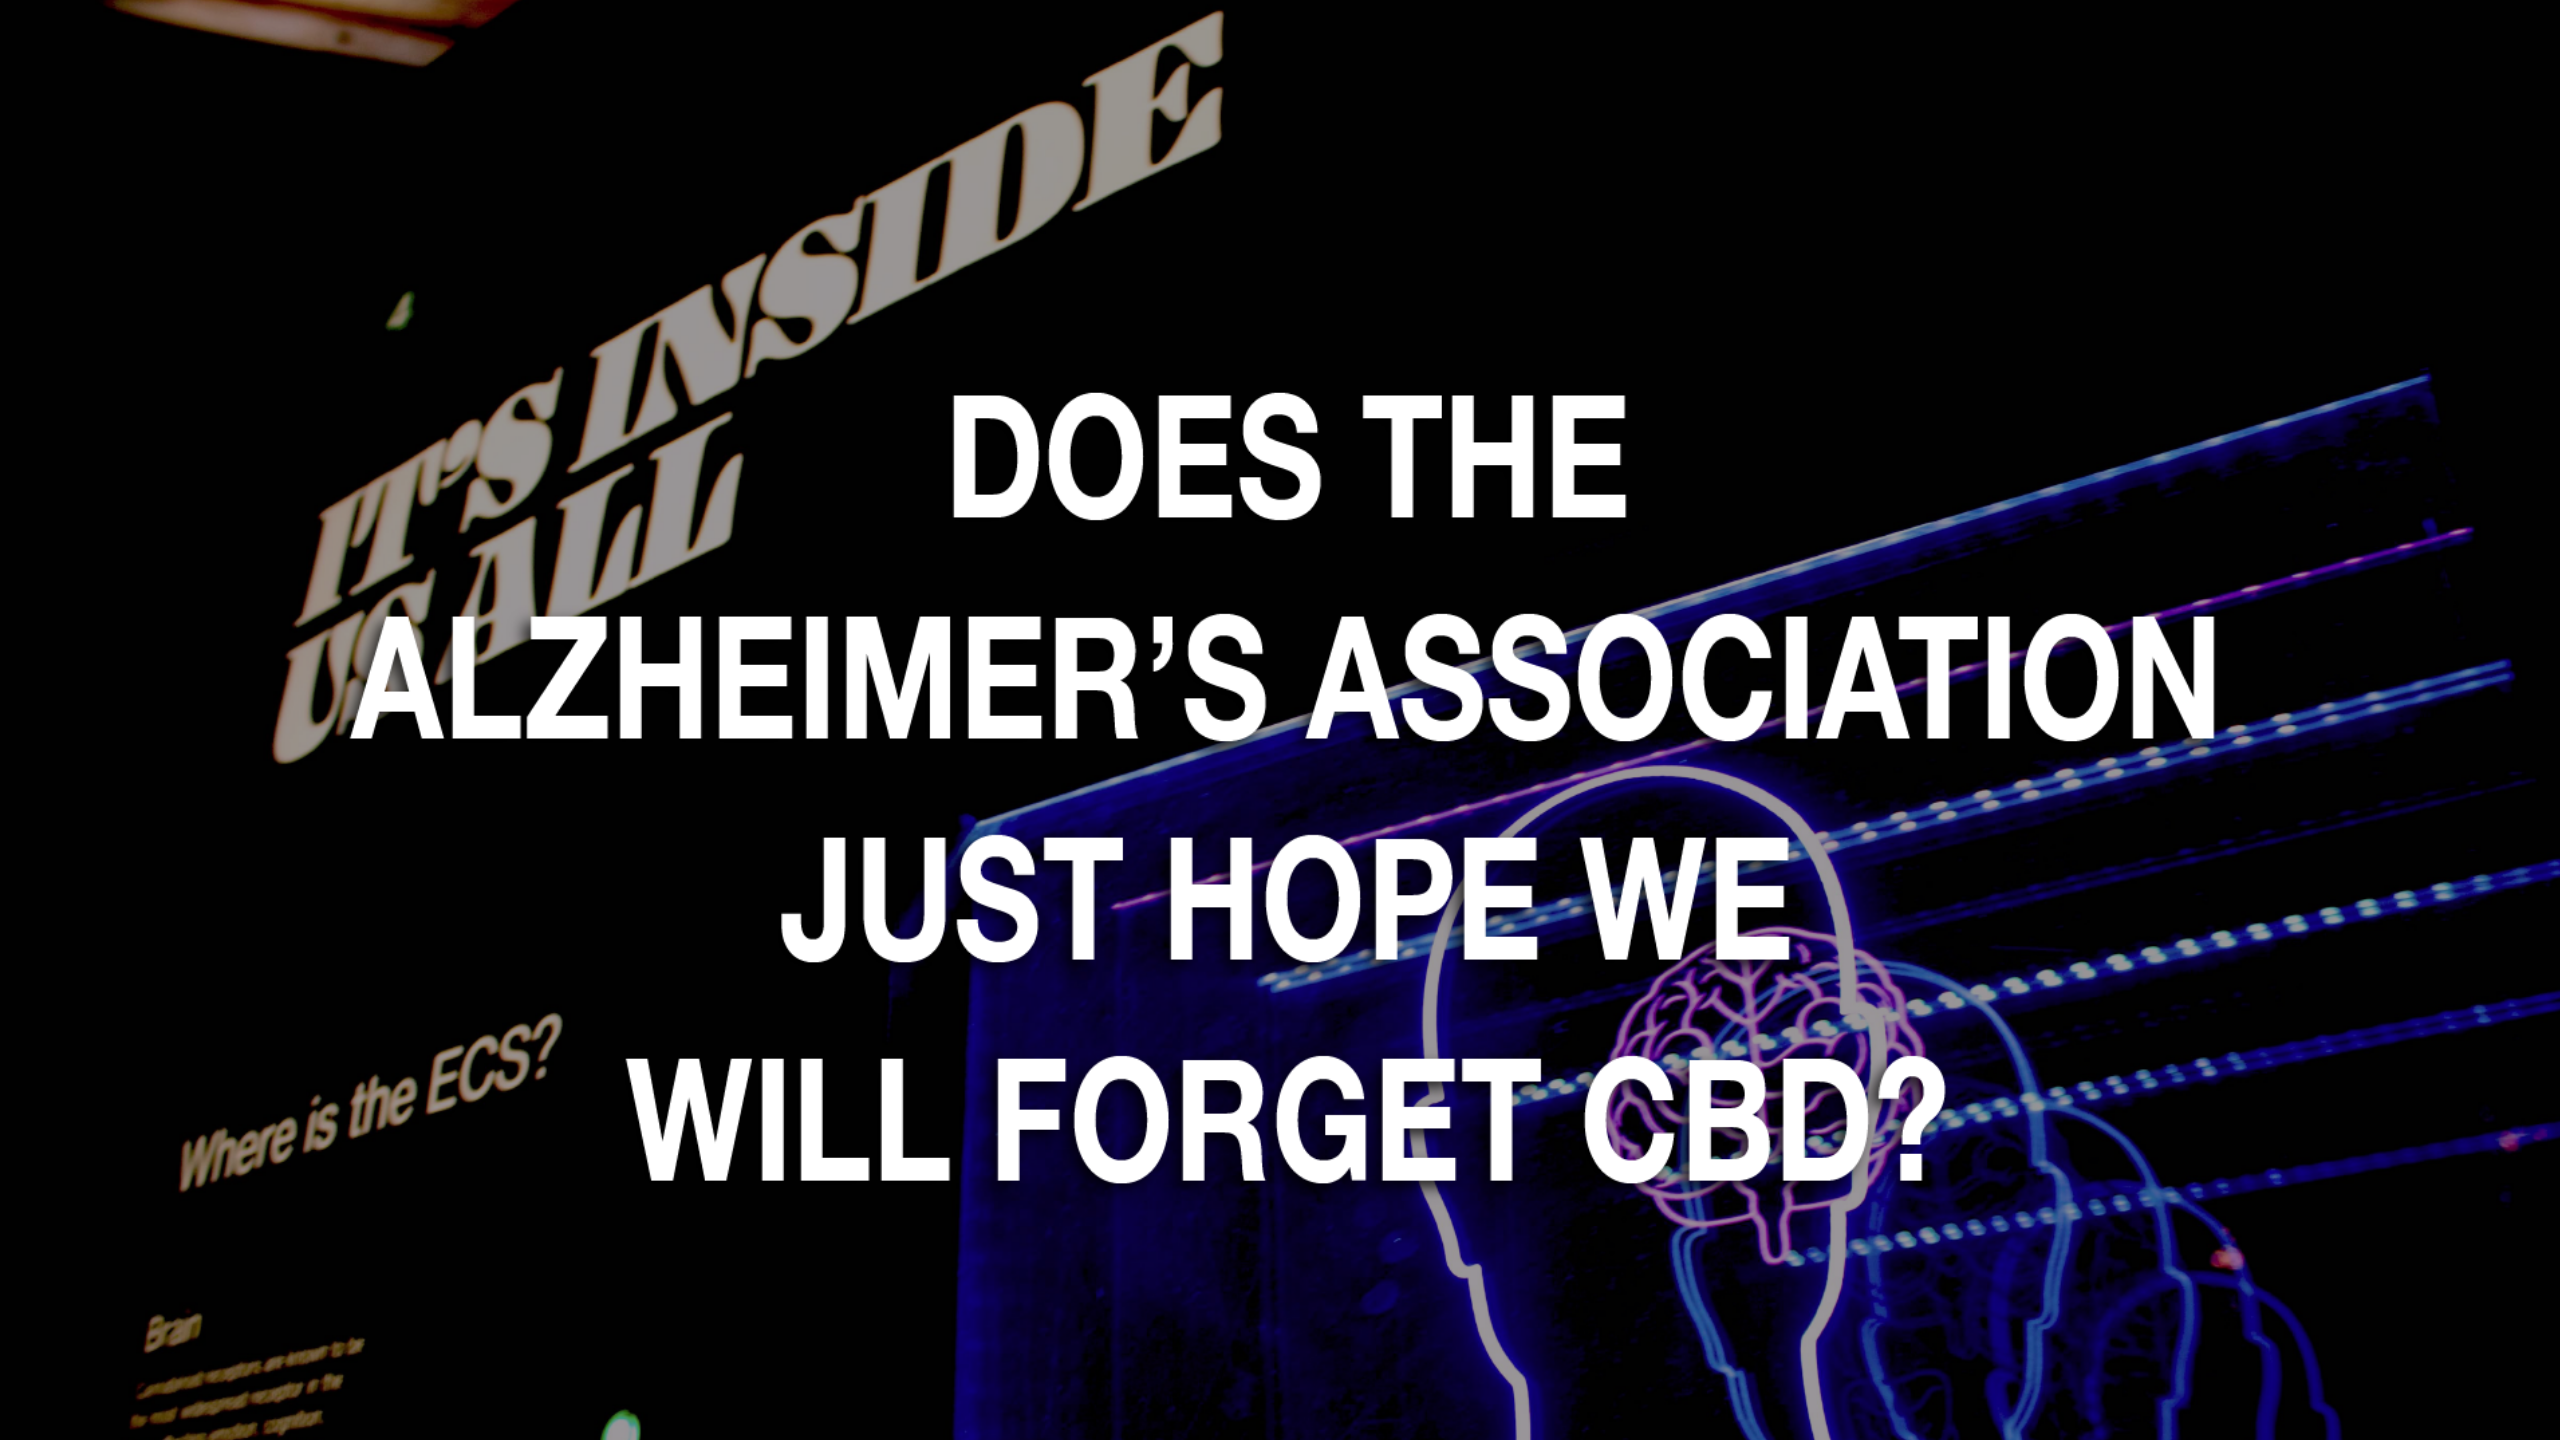 Newsweek AMPLIFY - Does The Alzheimer's Association